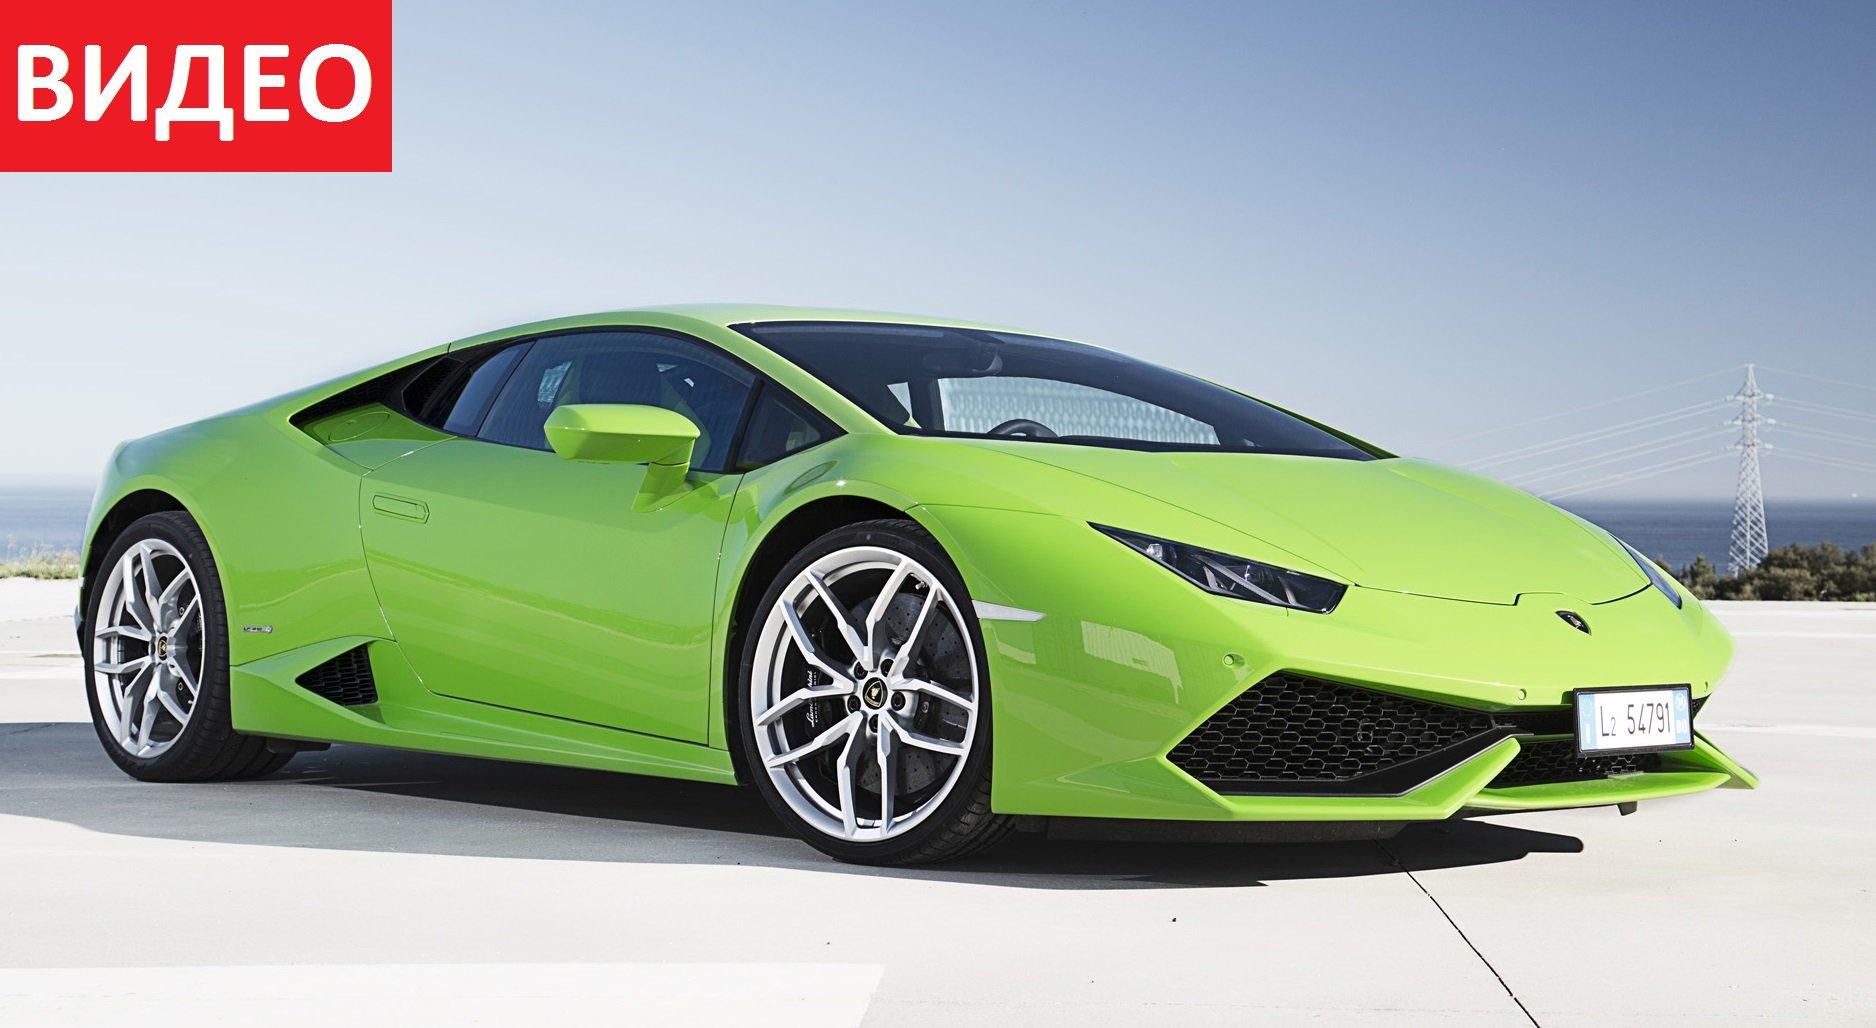 Lamborghini Huracan, авария на скорости за 300 км/ч [Видео]